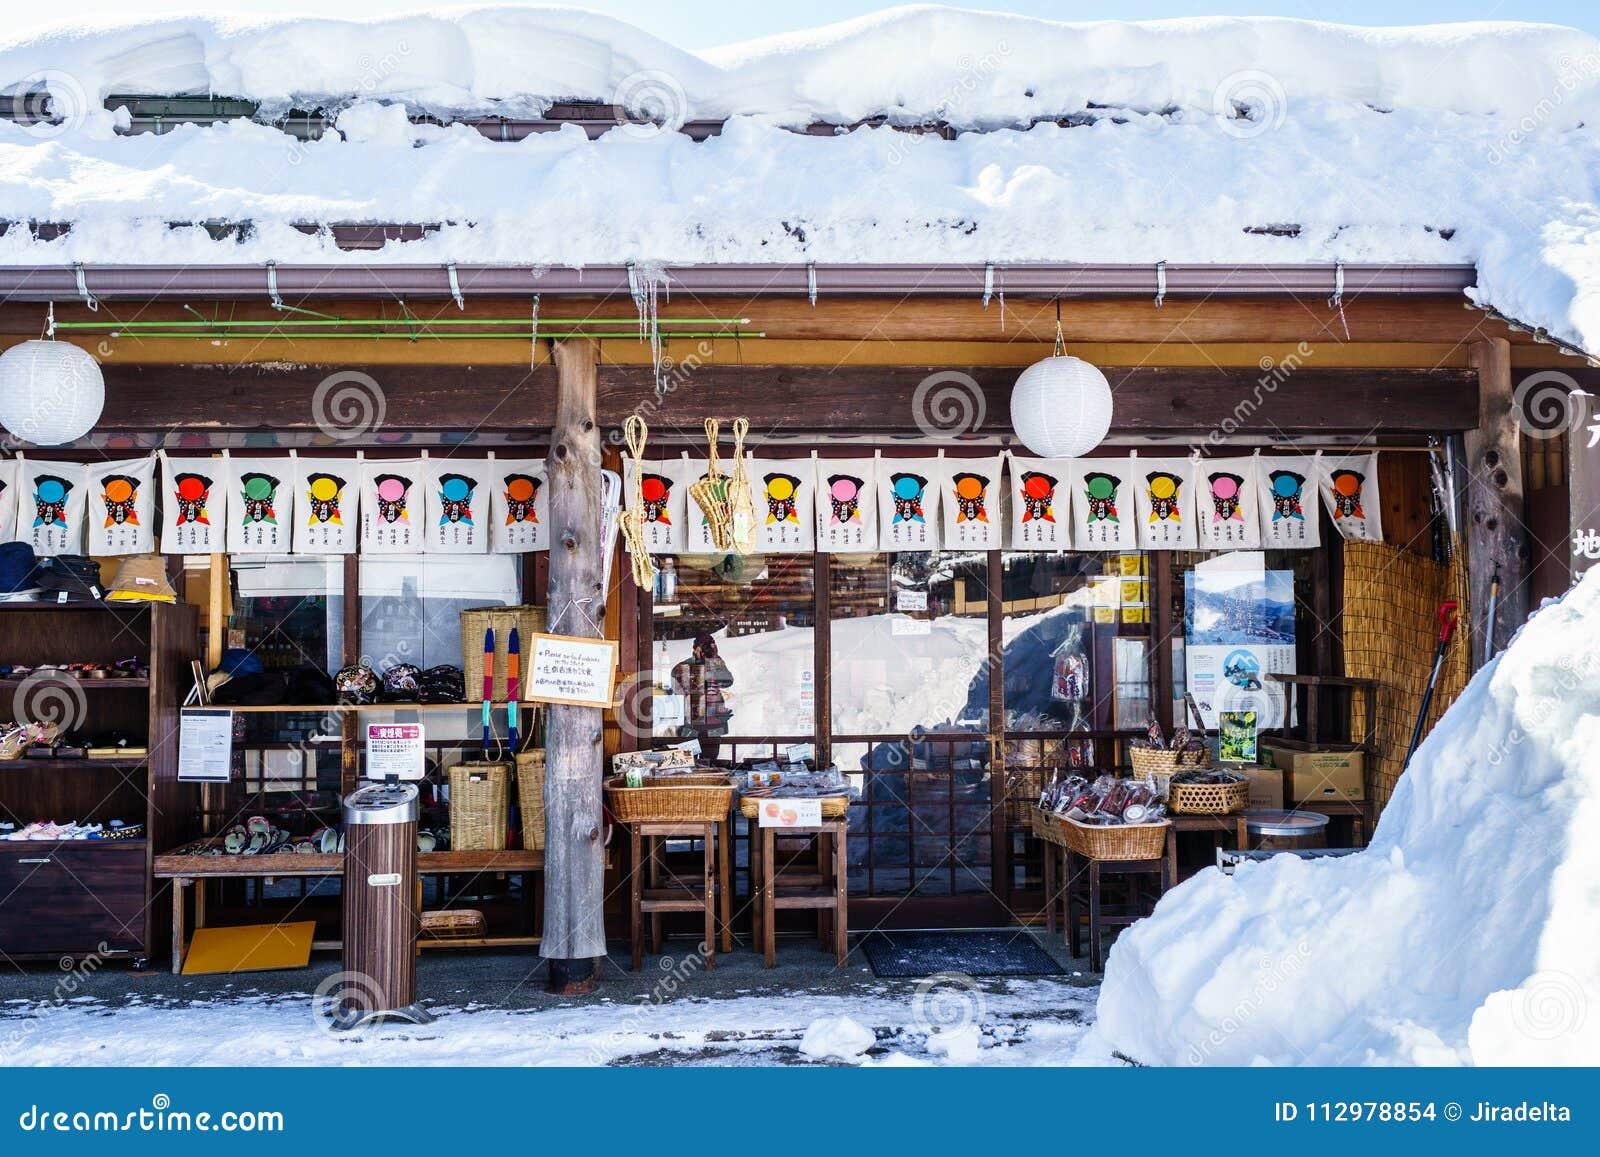 Urban house in Shirakawa-go with Snow